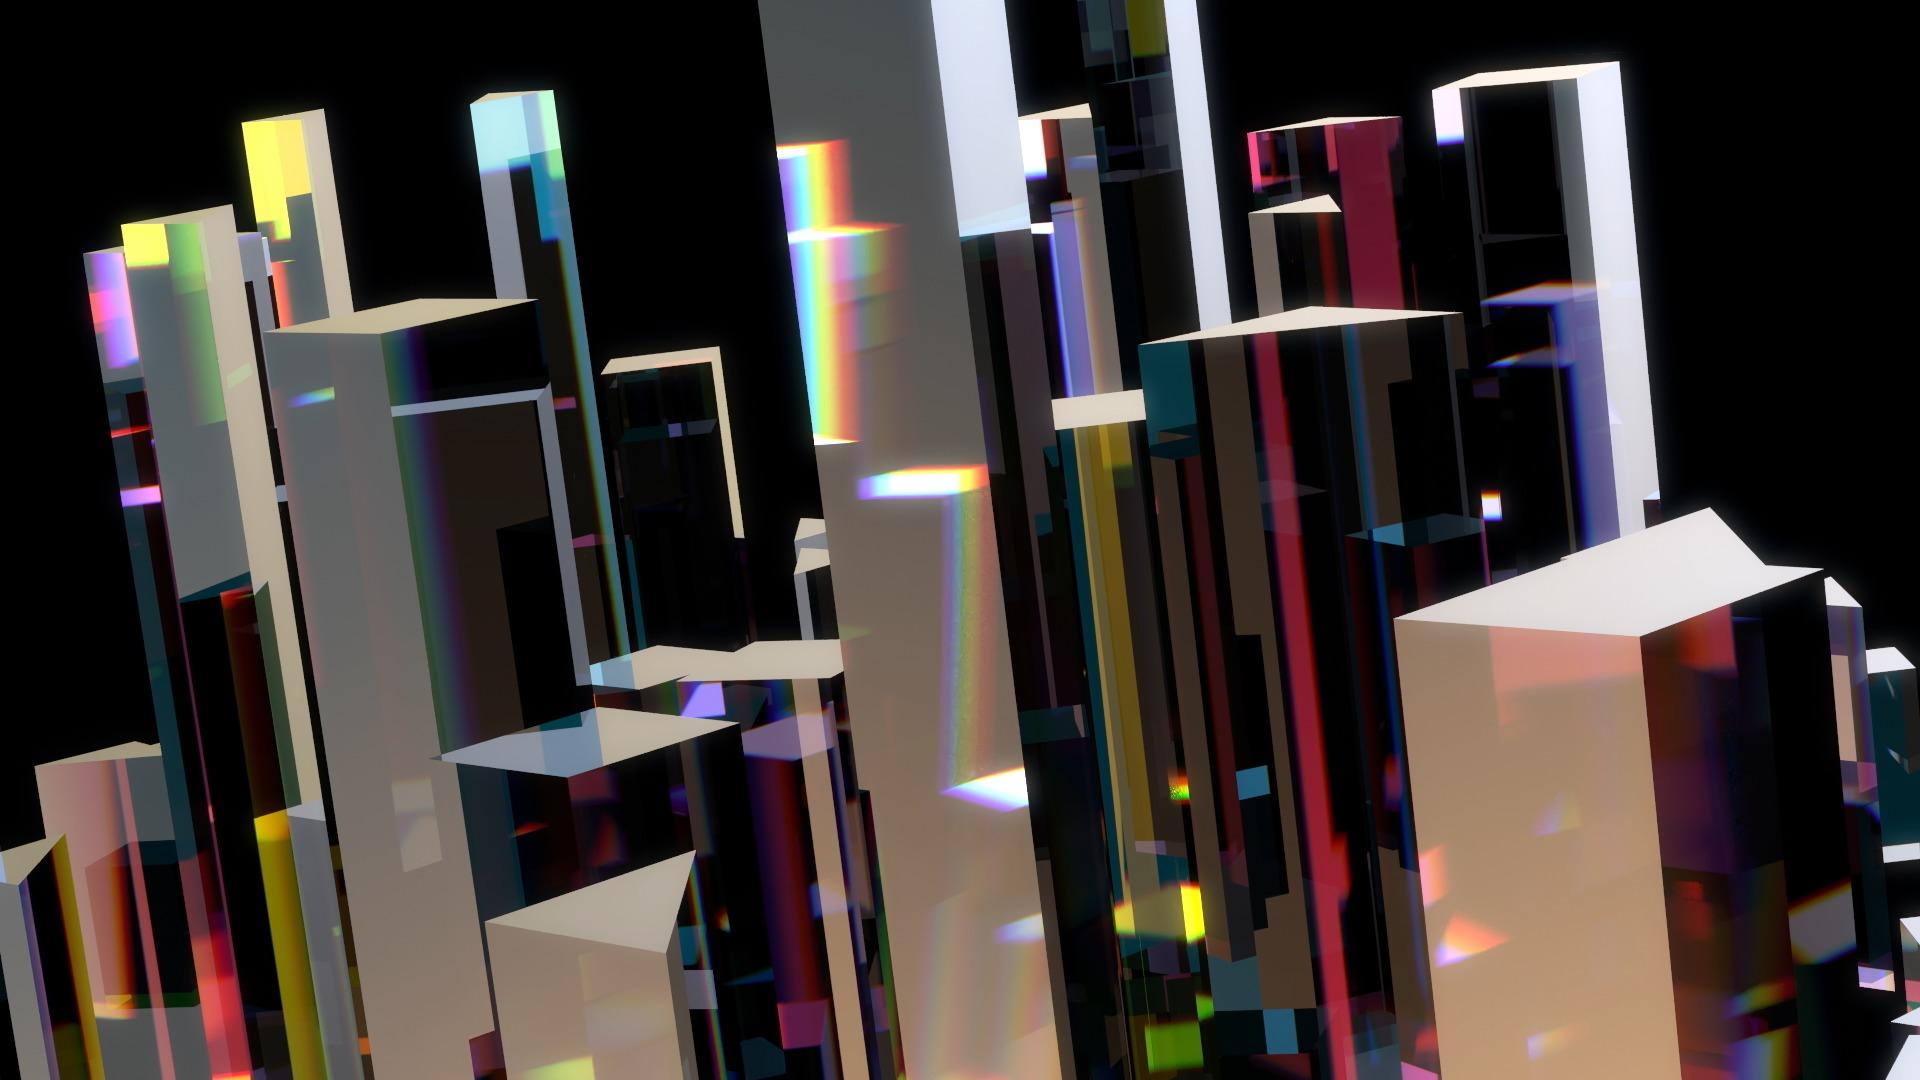 Void_Chords feat. Yui Mugino 「LIES & TIES」MV(モーショングラフィックス)